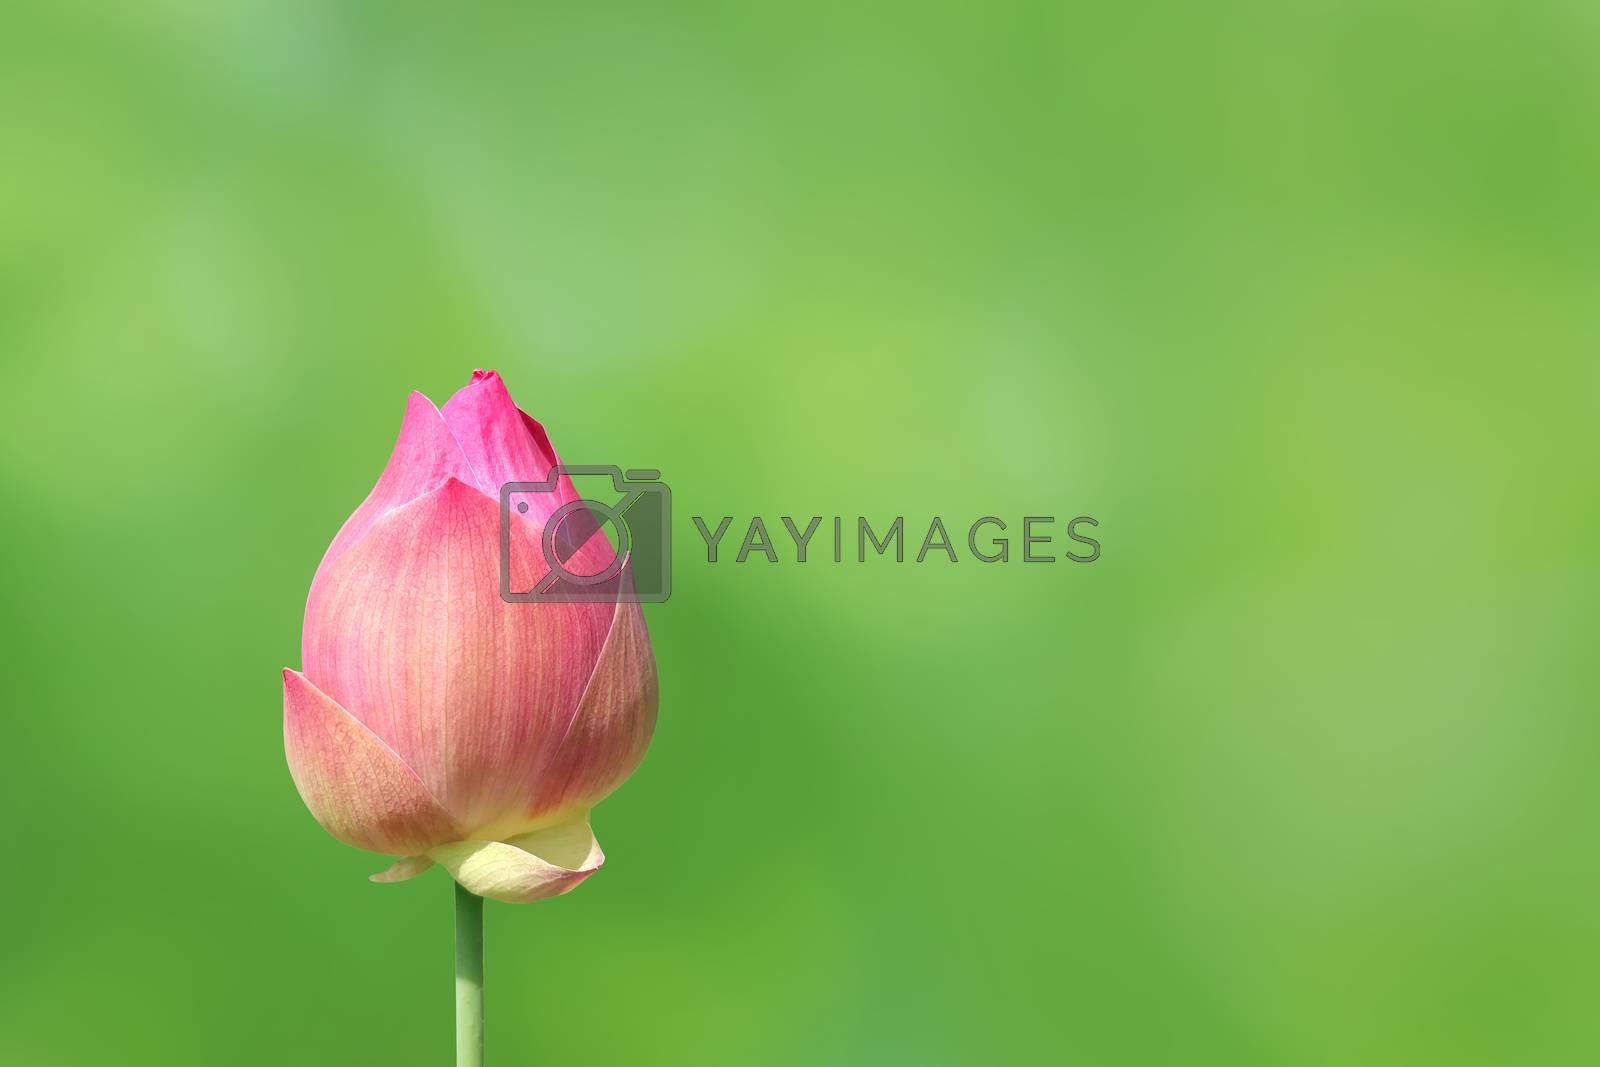 lotus bud on nature green background, lotus pink close-up photos, lotus bud pink flower, beautiful buds pink nature